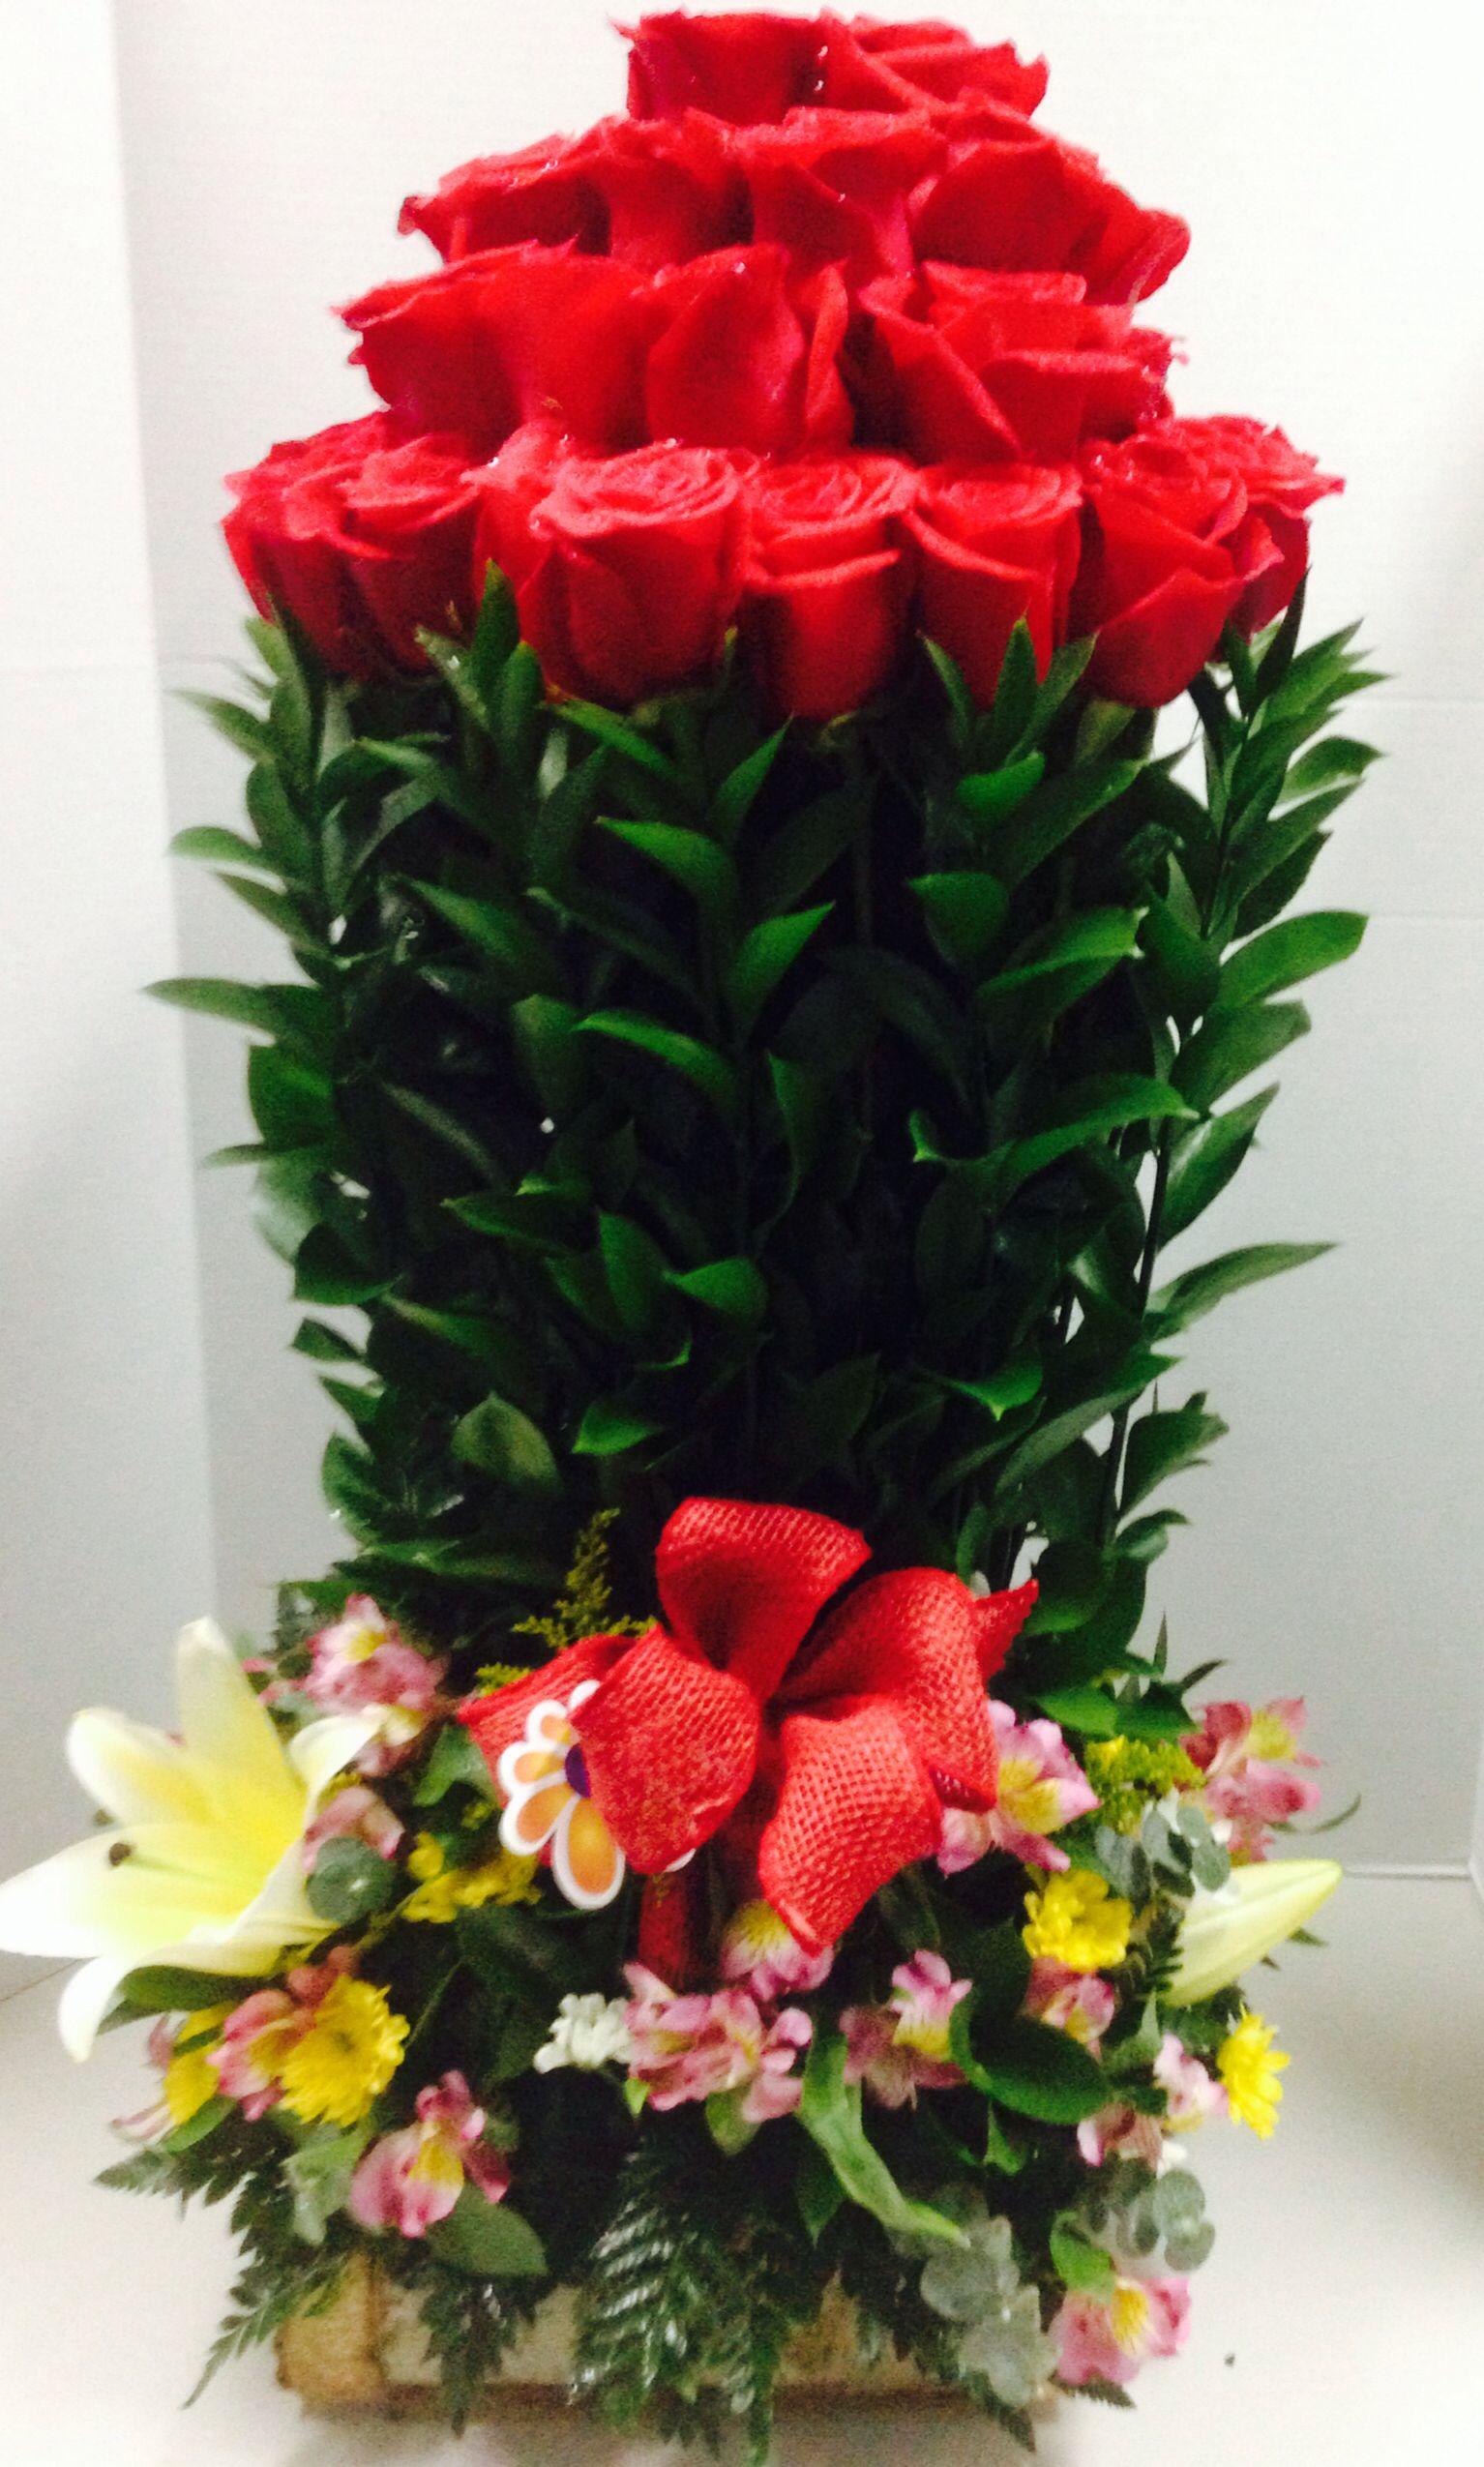 24 Rosas En Maceta De Madera Arreglo Florales Panama